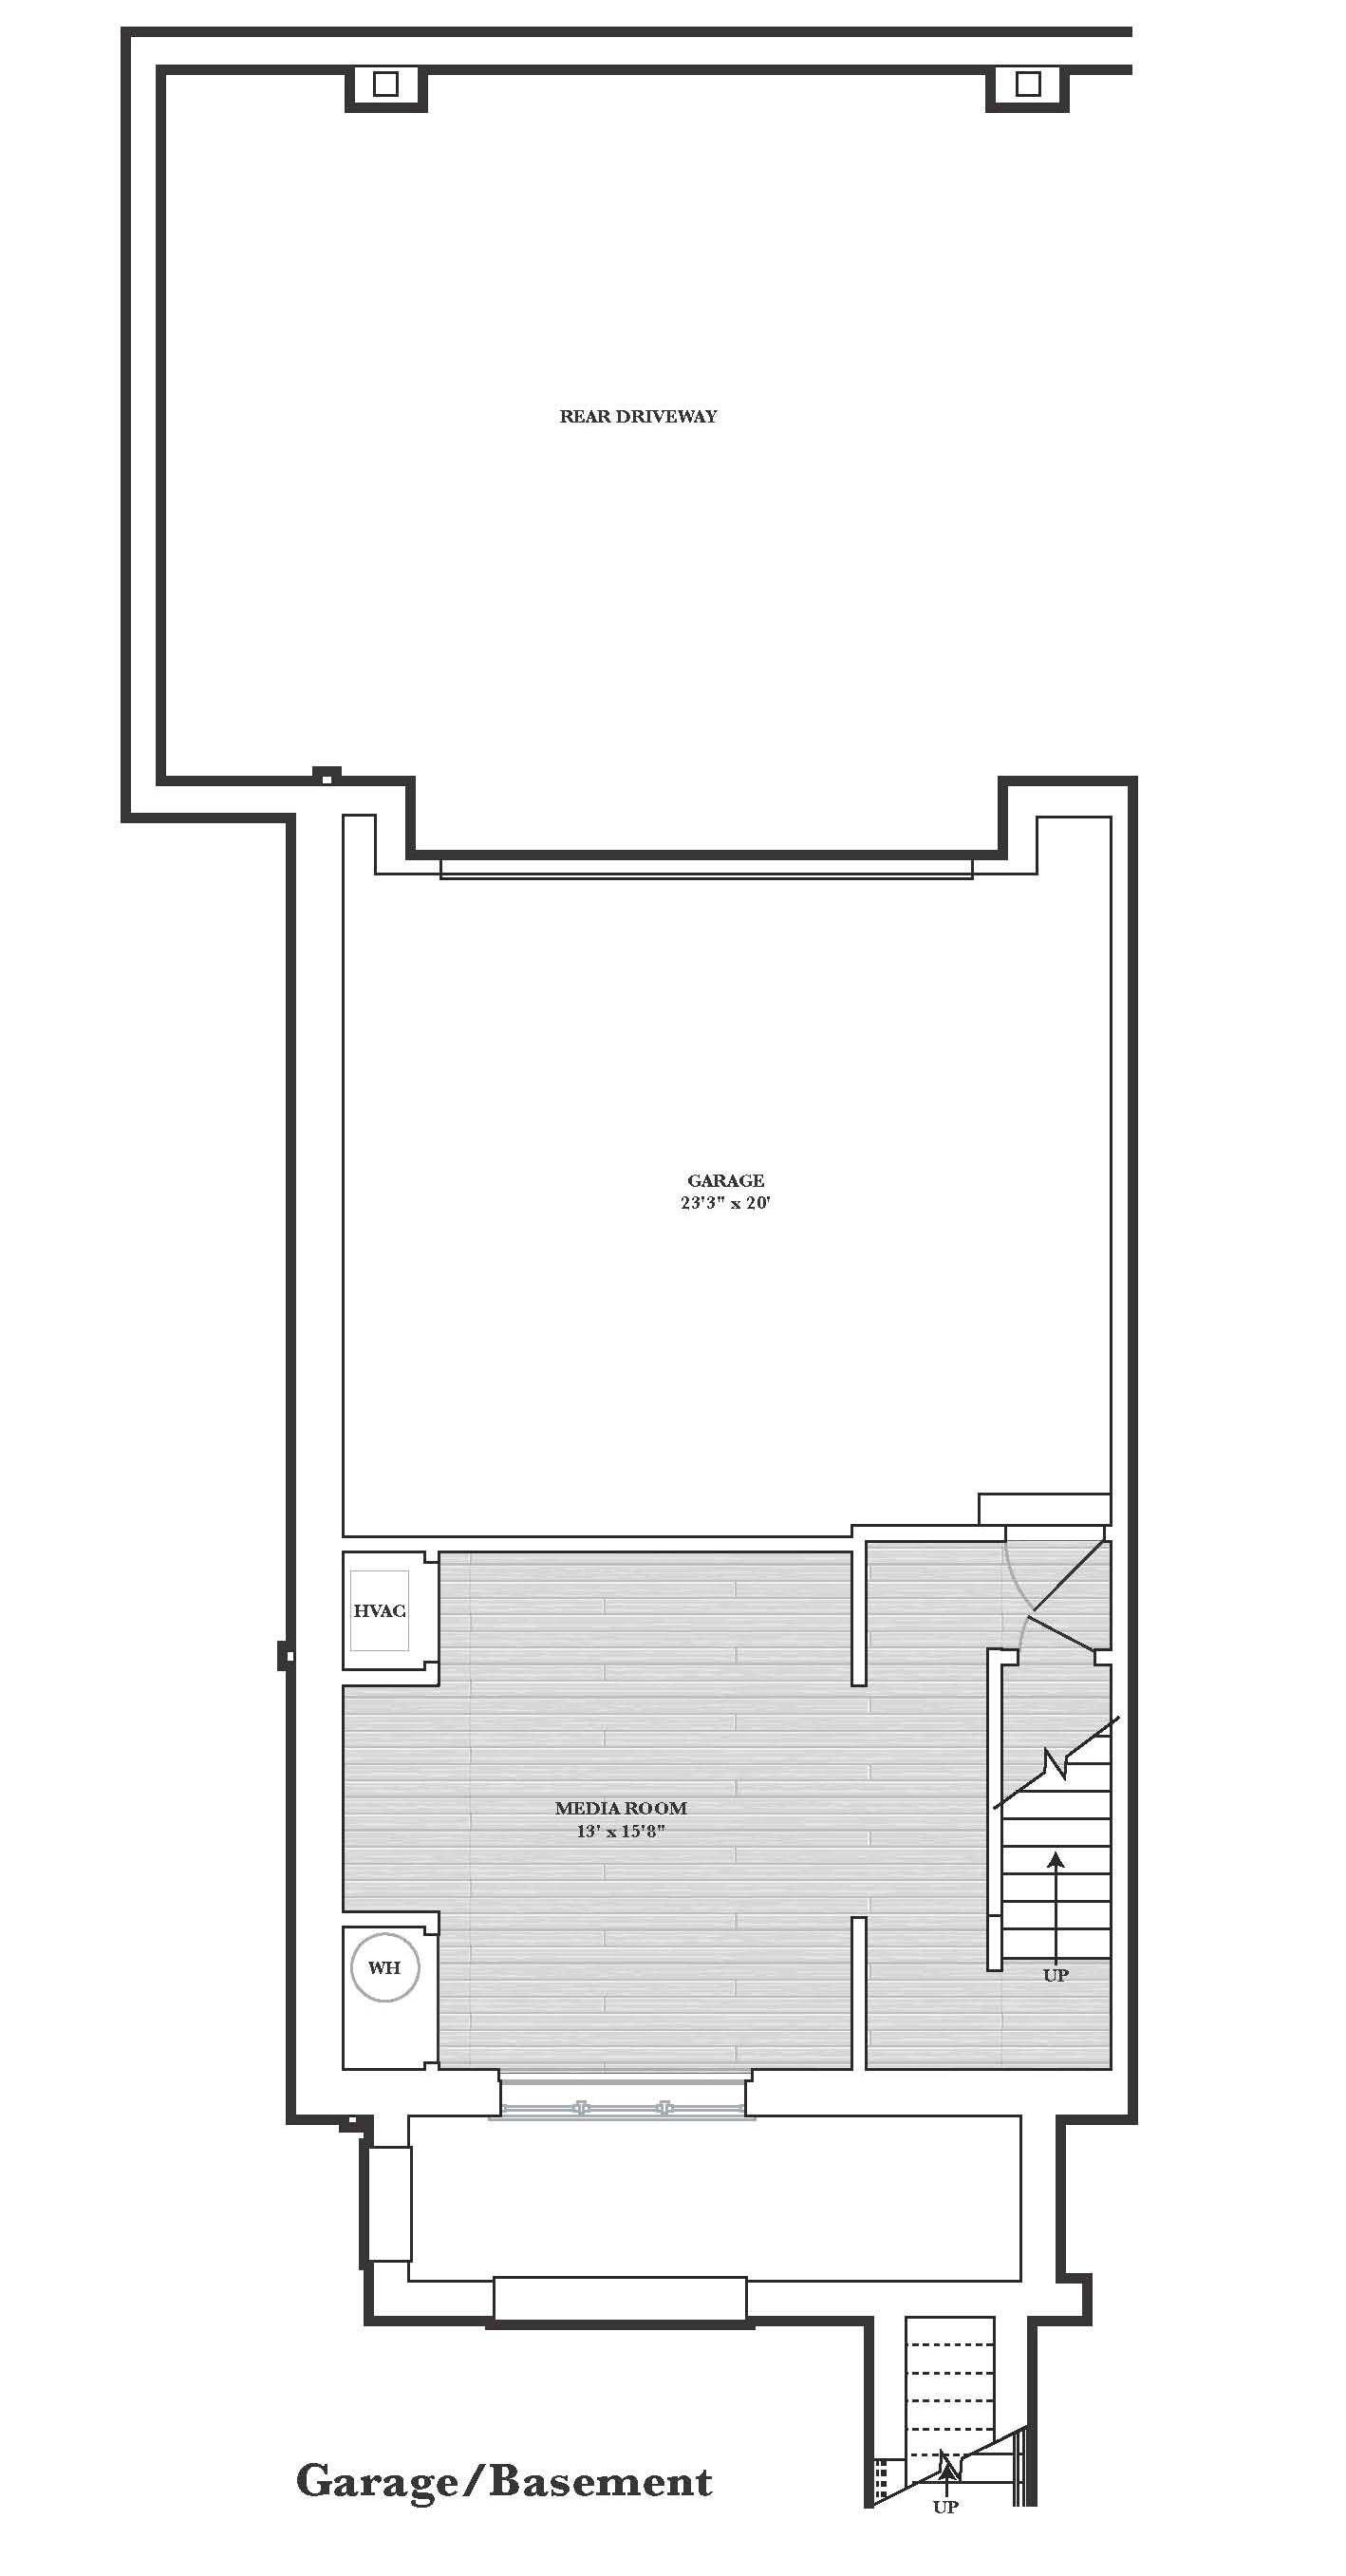 floorplan image of TH3339